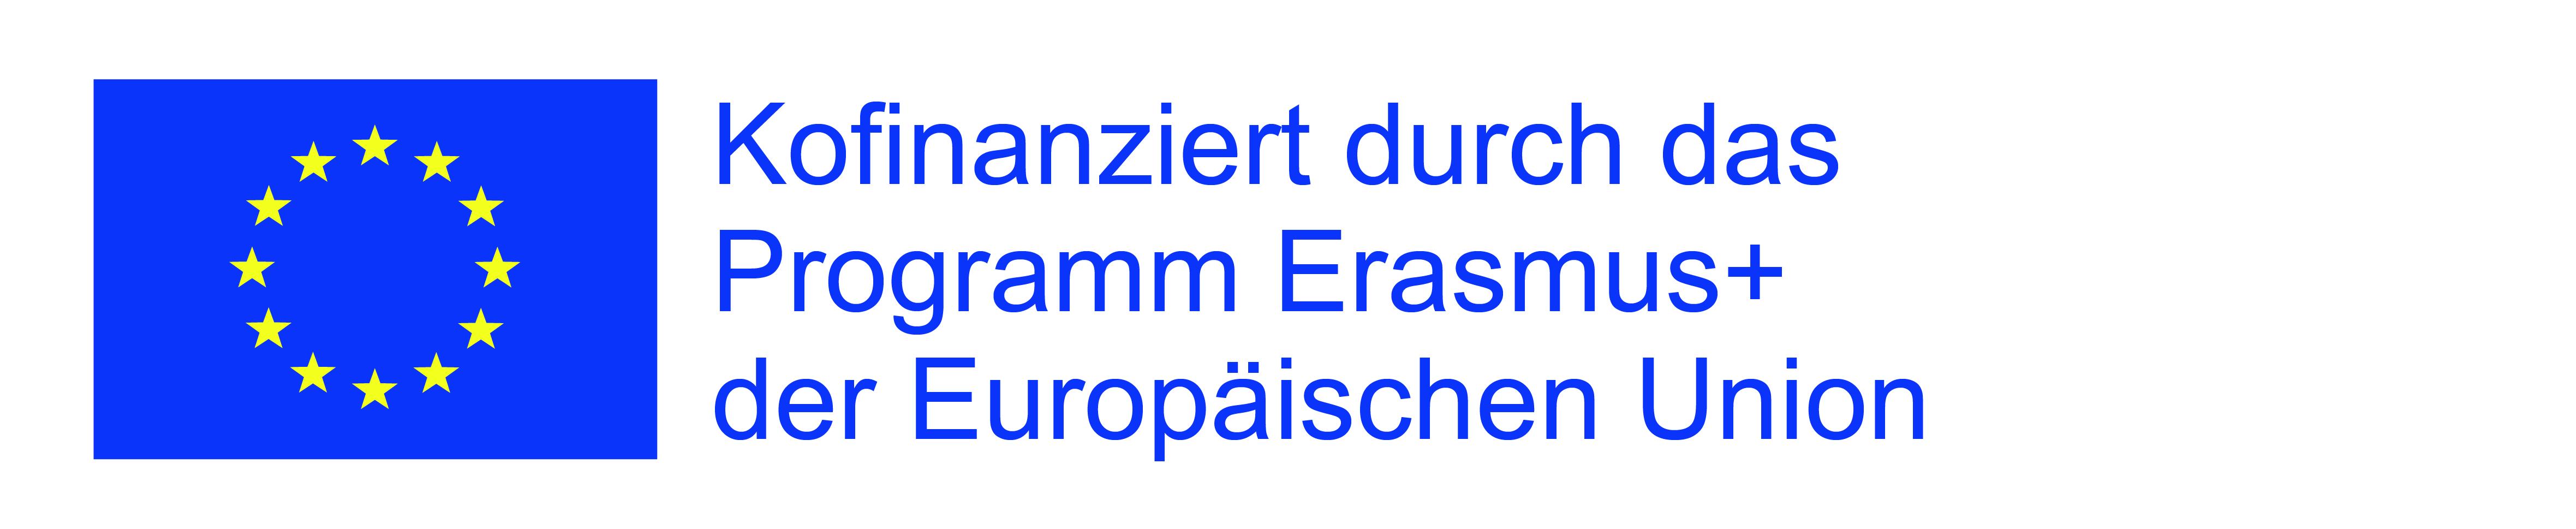 https://wayback.archive-it.org/12090/20210123161753/https://eacea.ec.europa.eu/sites/eacea-site/files/logosbeneficaireserasmusright_de_1.jpg